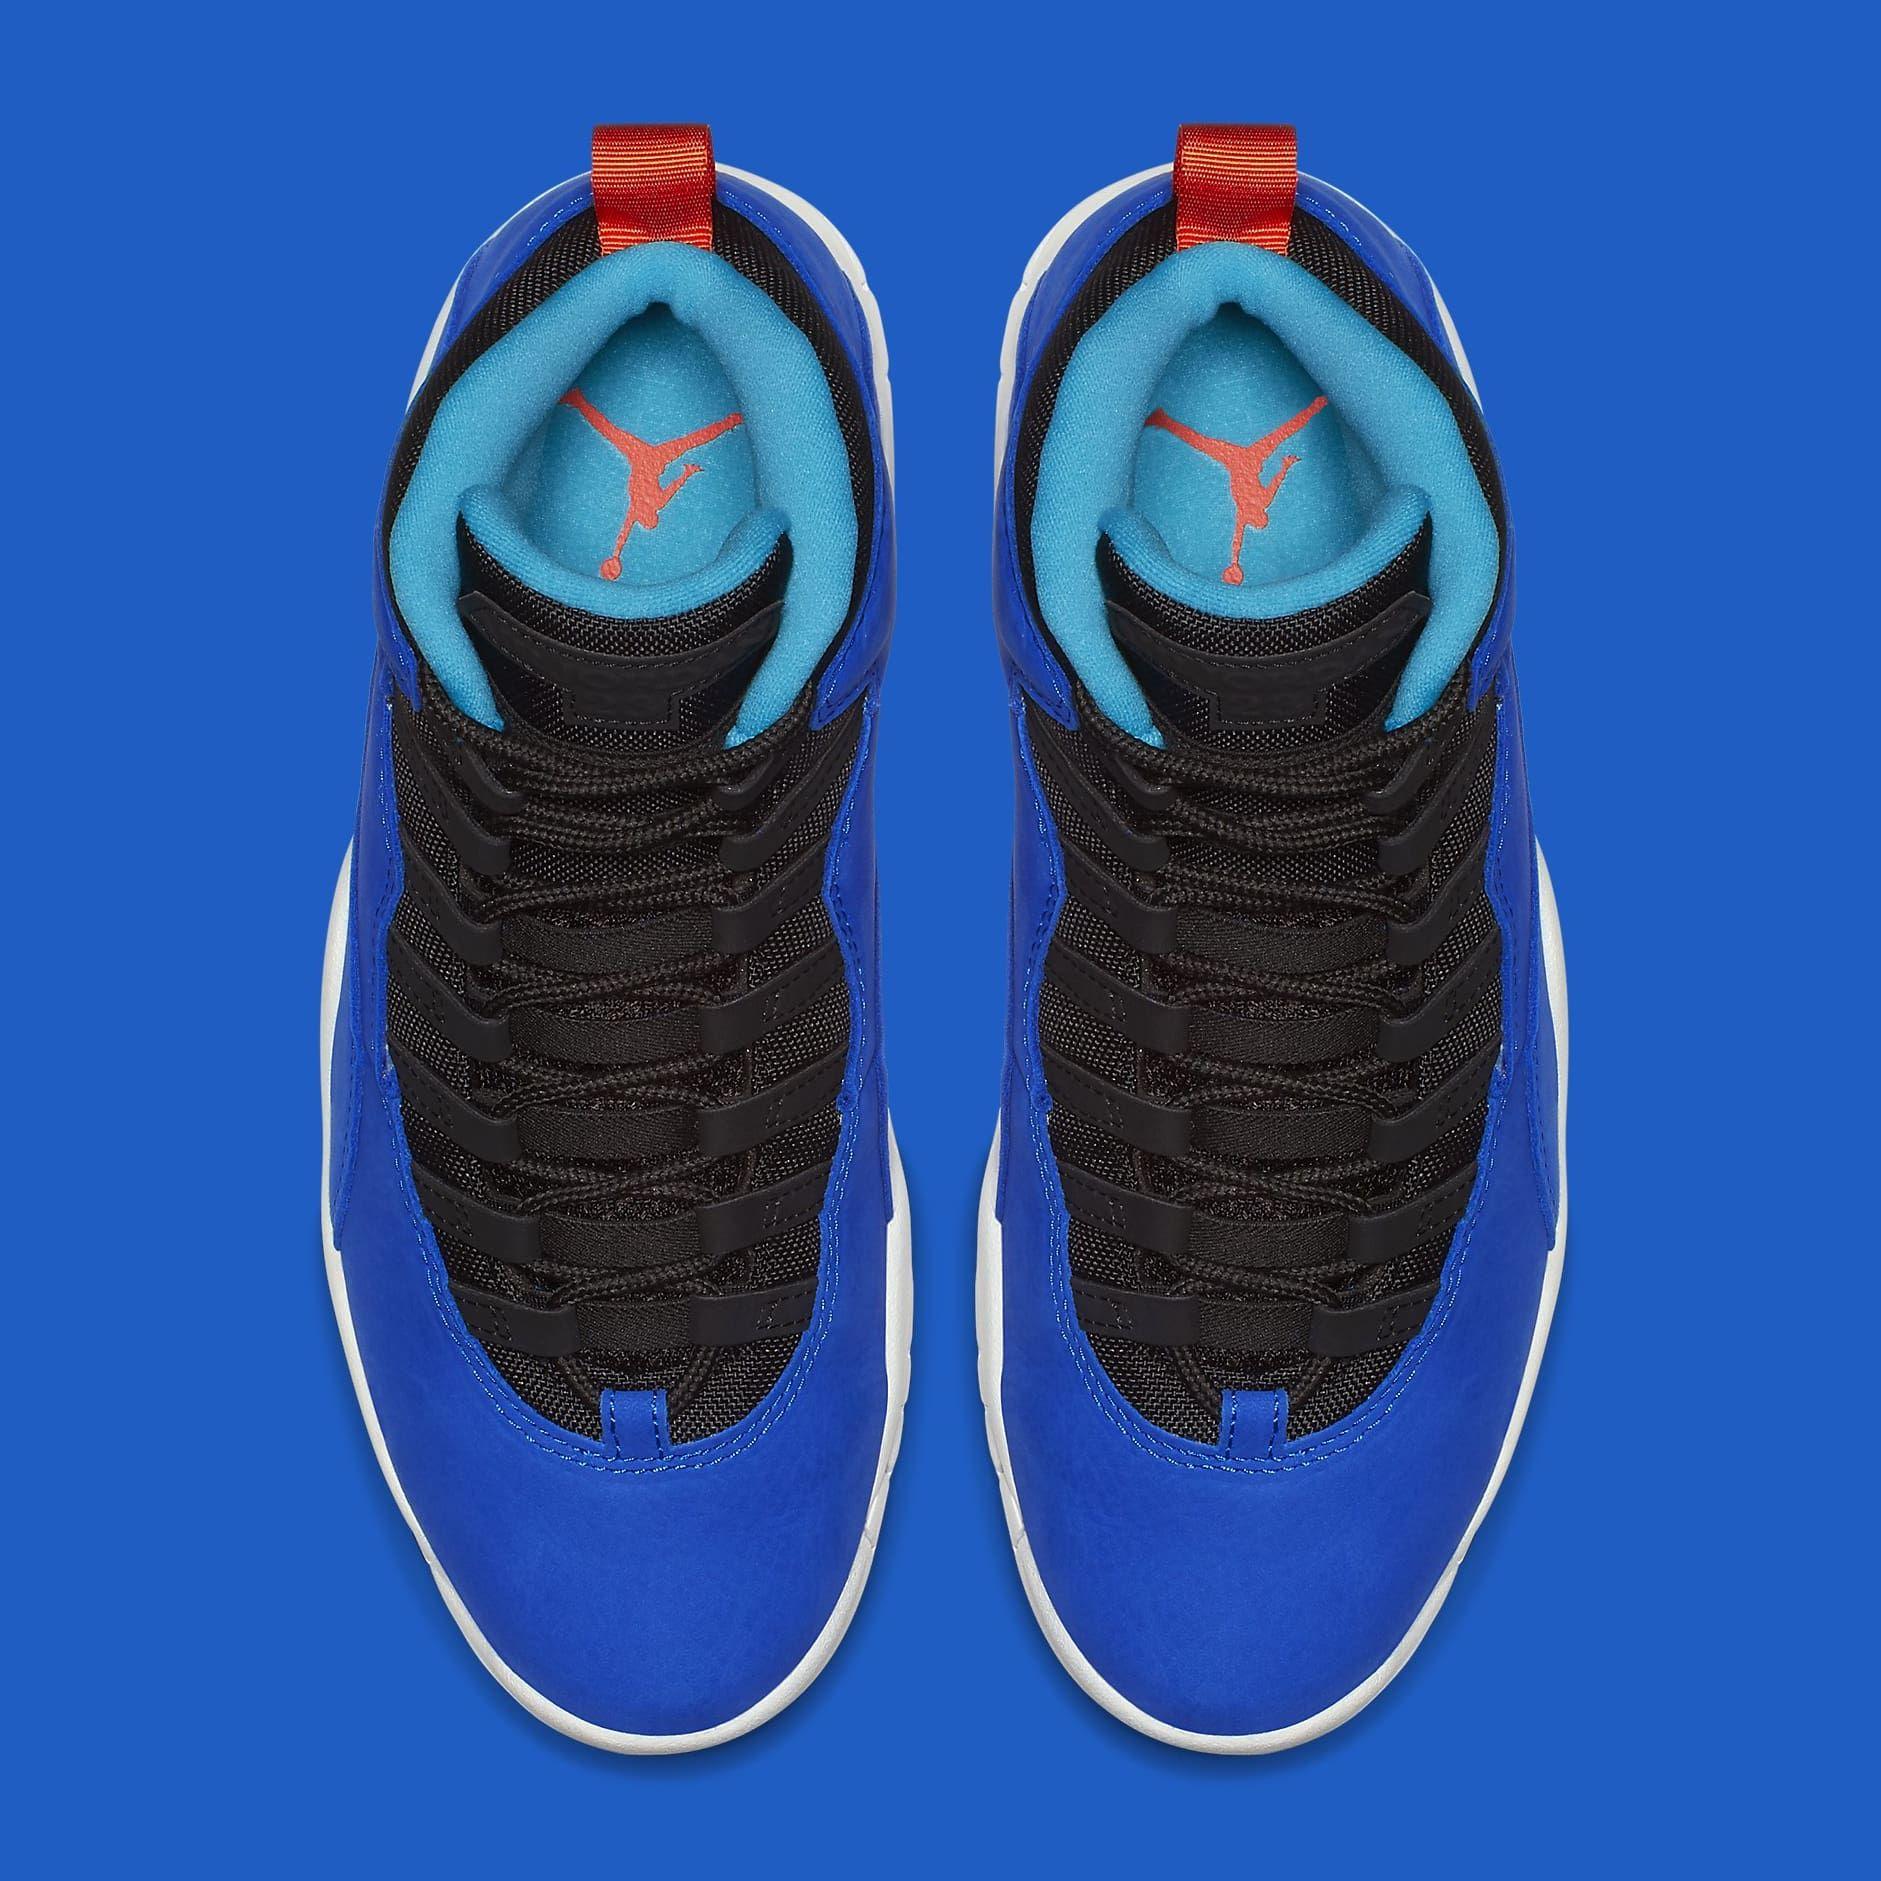 new products 348c8 e6e1c Air Jordan 10 X Tinker Huarache Light Release Date 310805 ...